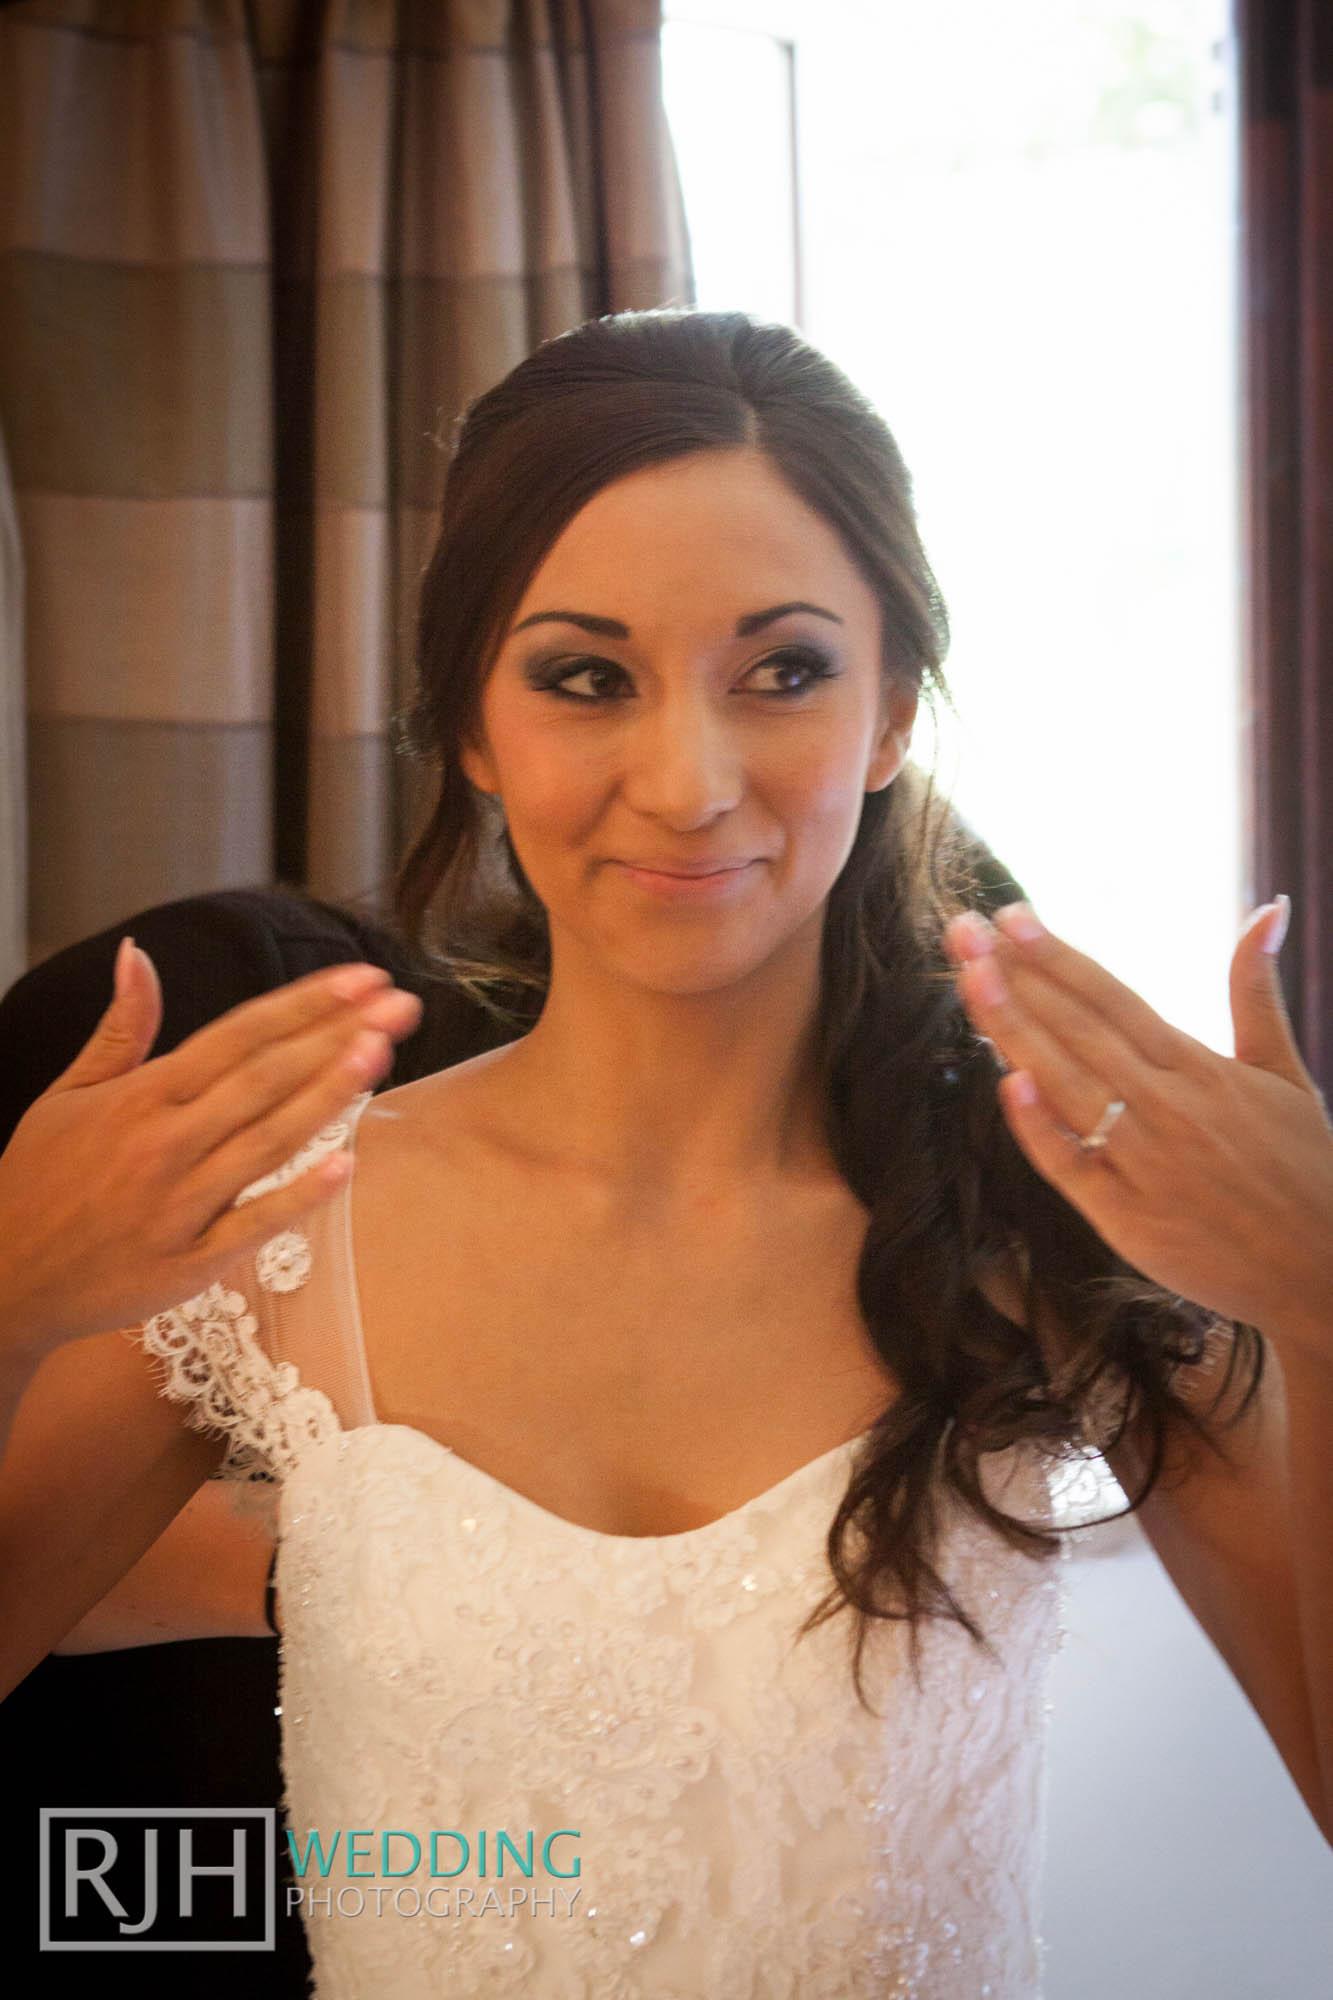 RJH Wedding Photography_Tankersley Manor Wedding_15.jpg